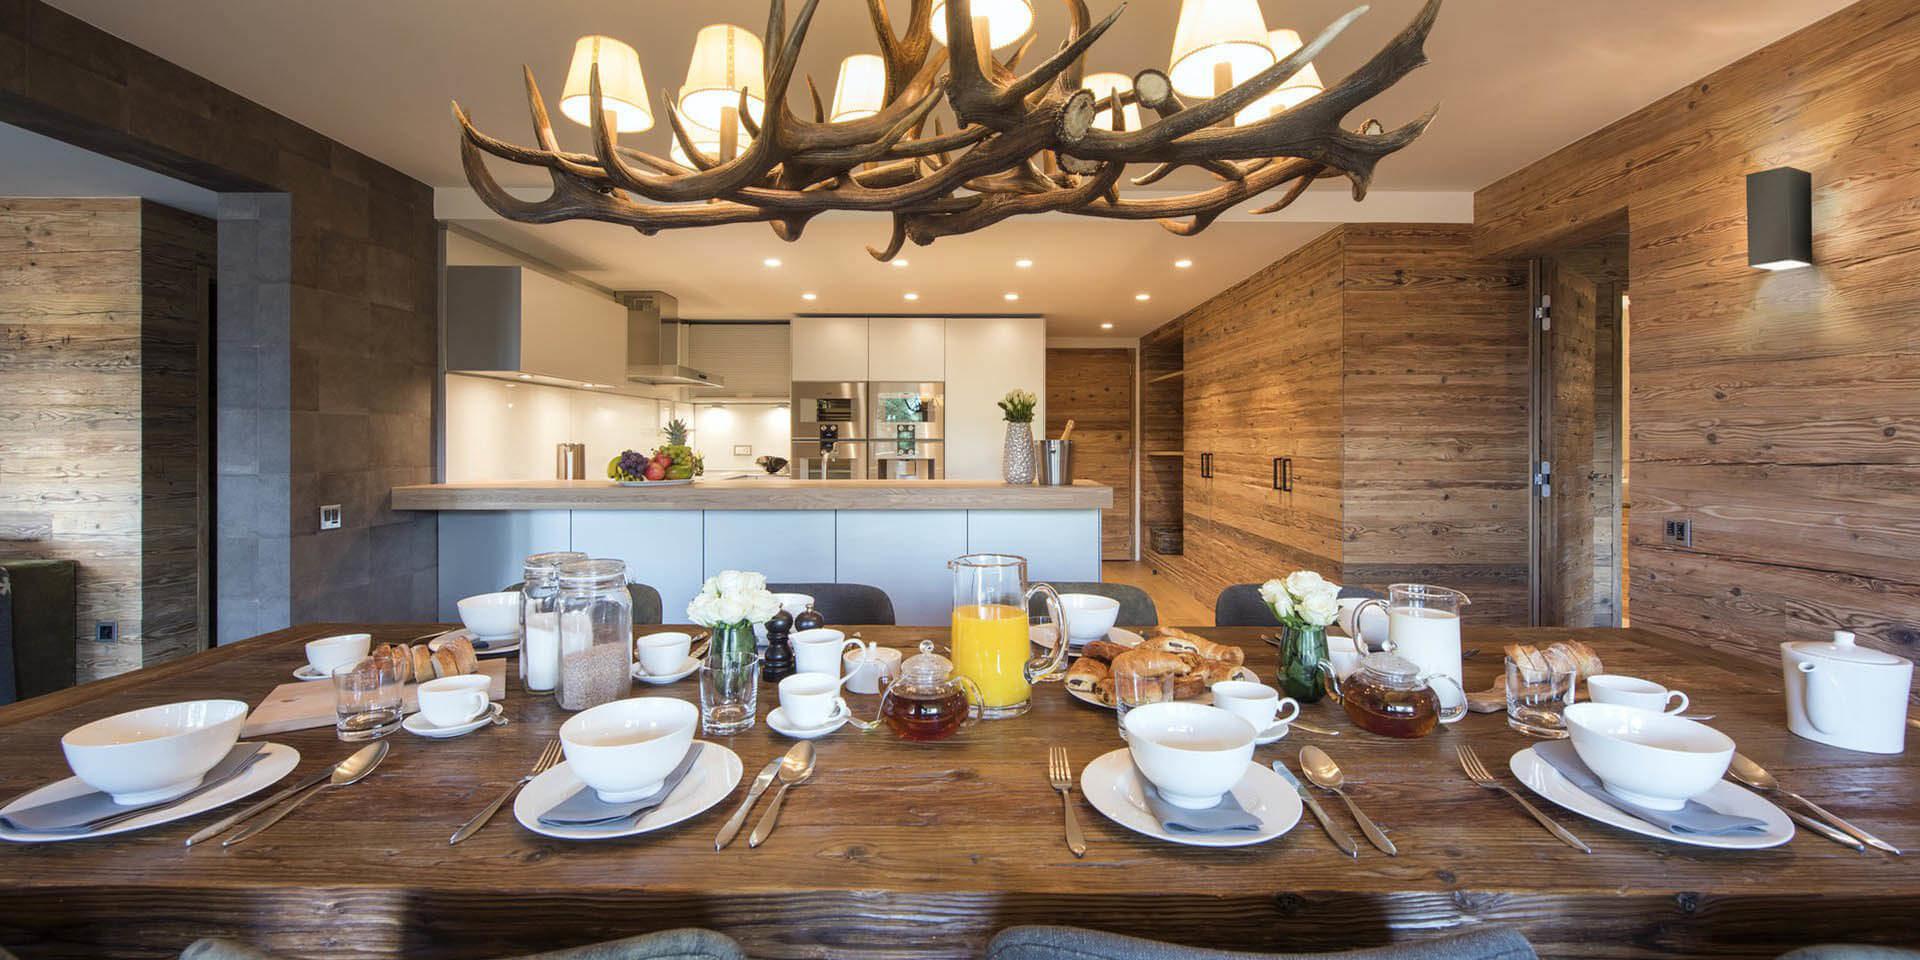 Appartement Rosalp 4 Verbier Les 4 Vallees Zwitserland wintersport skivakantie luxe eetkamer gedekte tafel ontbijt kroonluchter hout keuken bar vers fruit